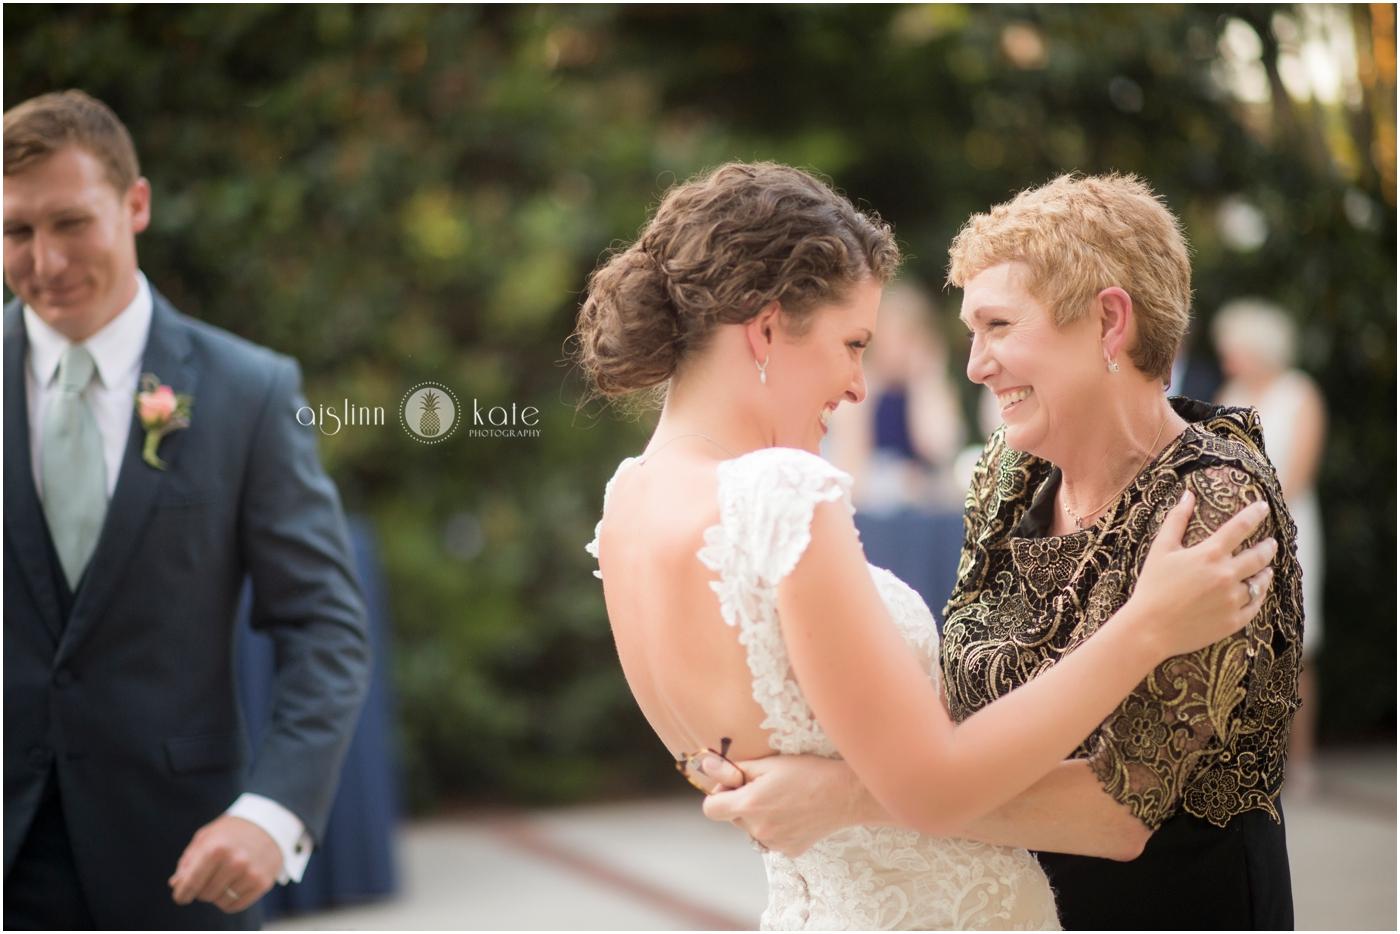 Pensacola-Destin-Wedding-Photographer_6514.jpg